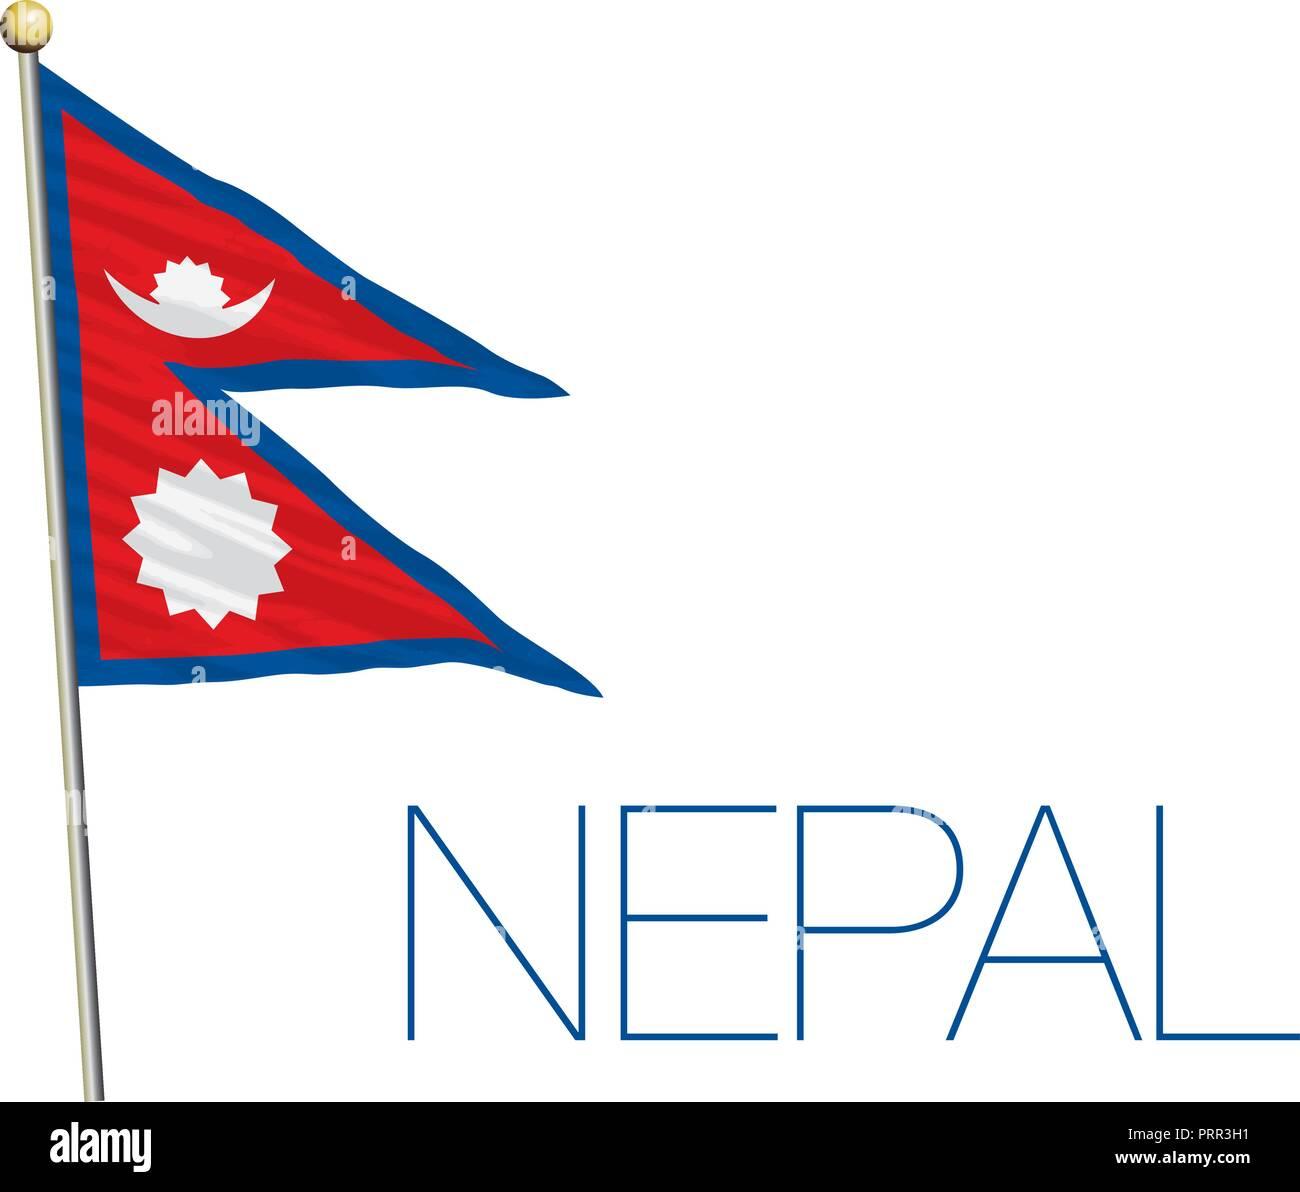 Nepal official flag, vector illustration - Stock Vector